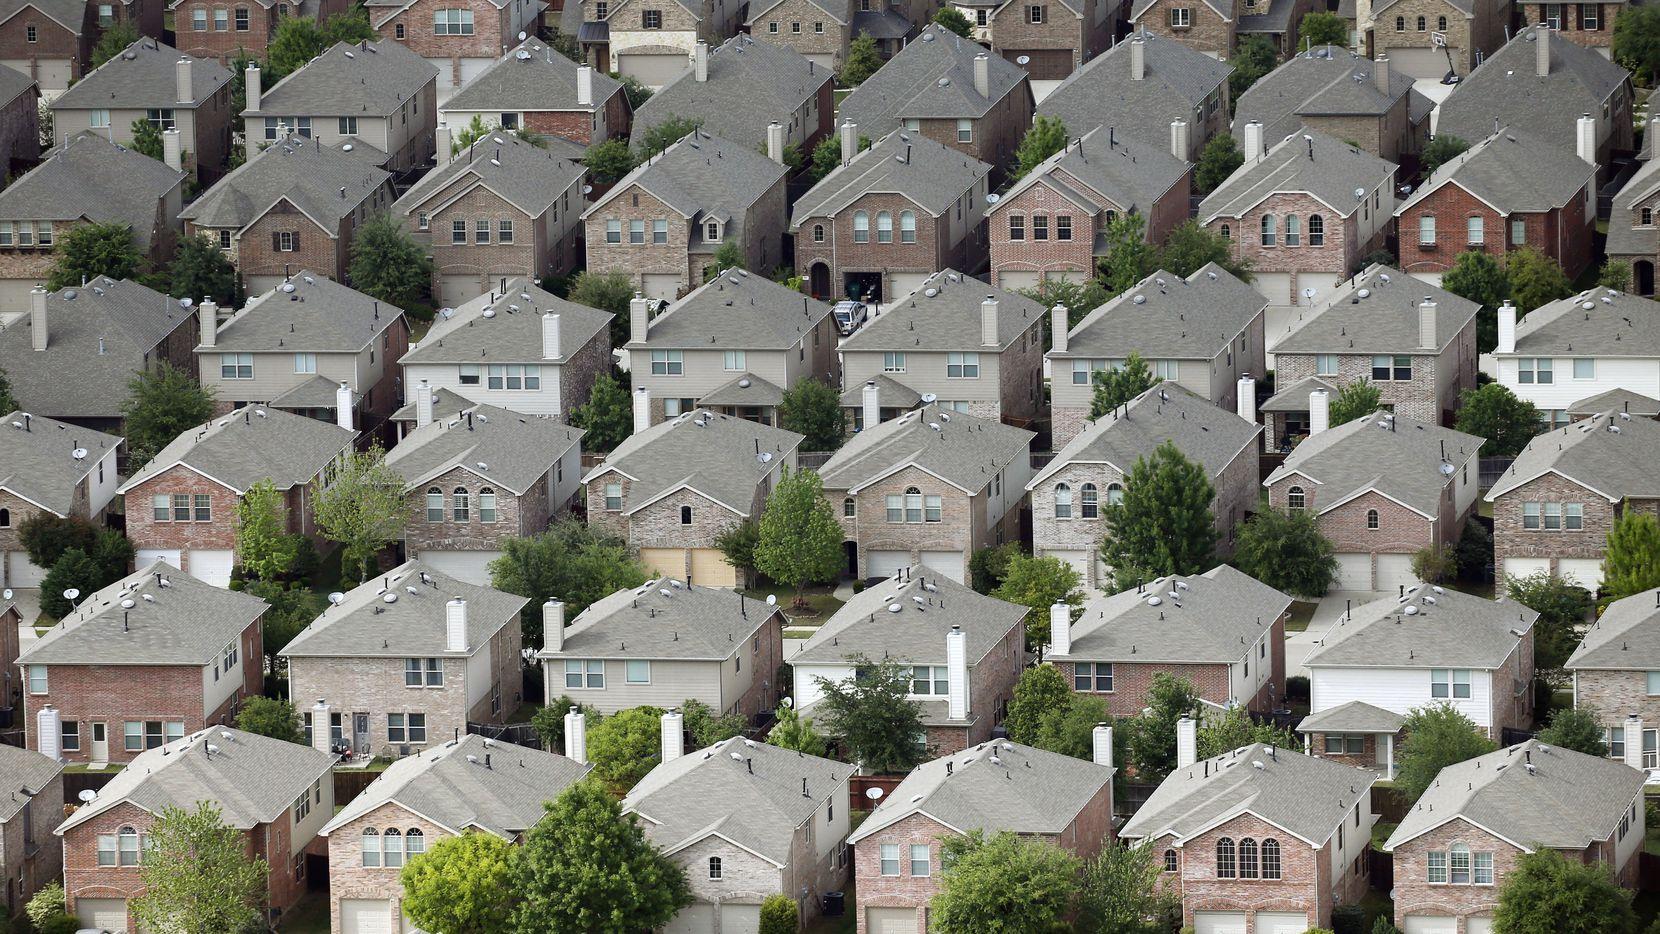 Frisco, Denton, McKinney, Carrollton and Allen were scored among the best U.S. real estate markets by WalletHub.